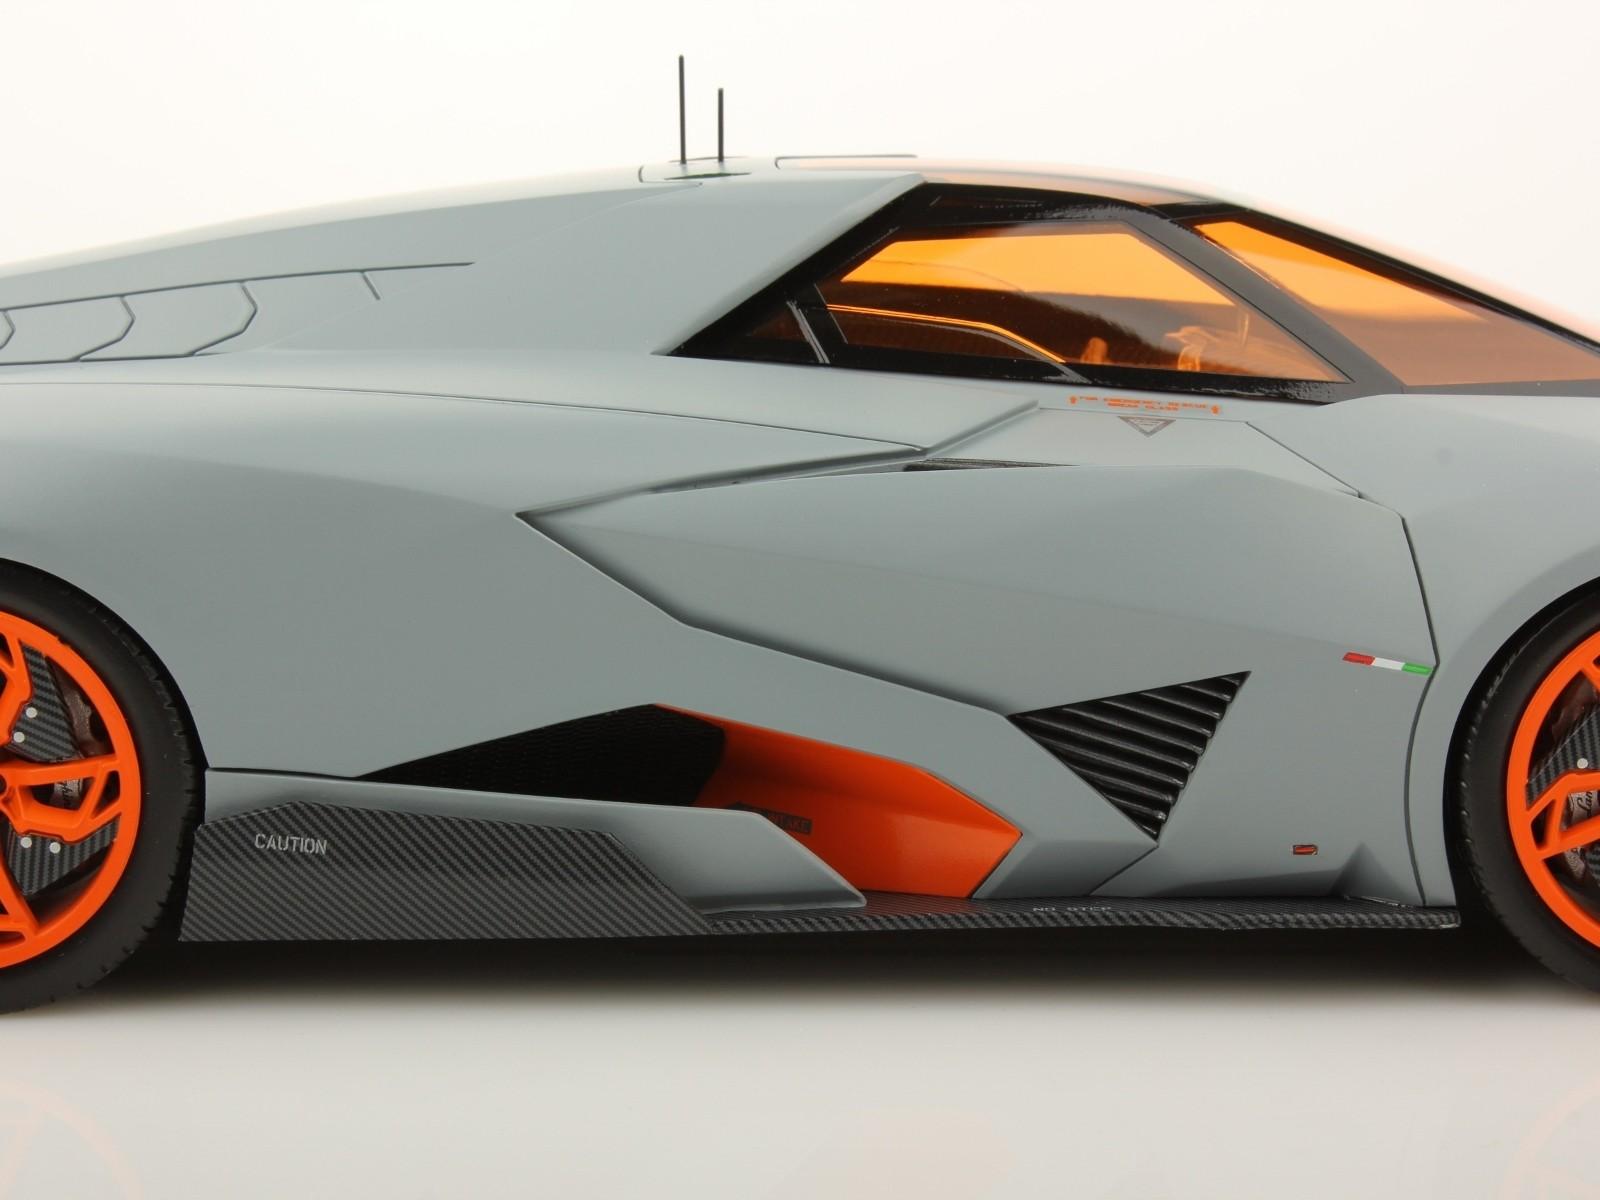 Lamborghini Egoista 1 18 Scale Model Is More Awesome Than The Real